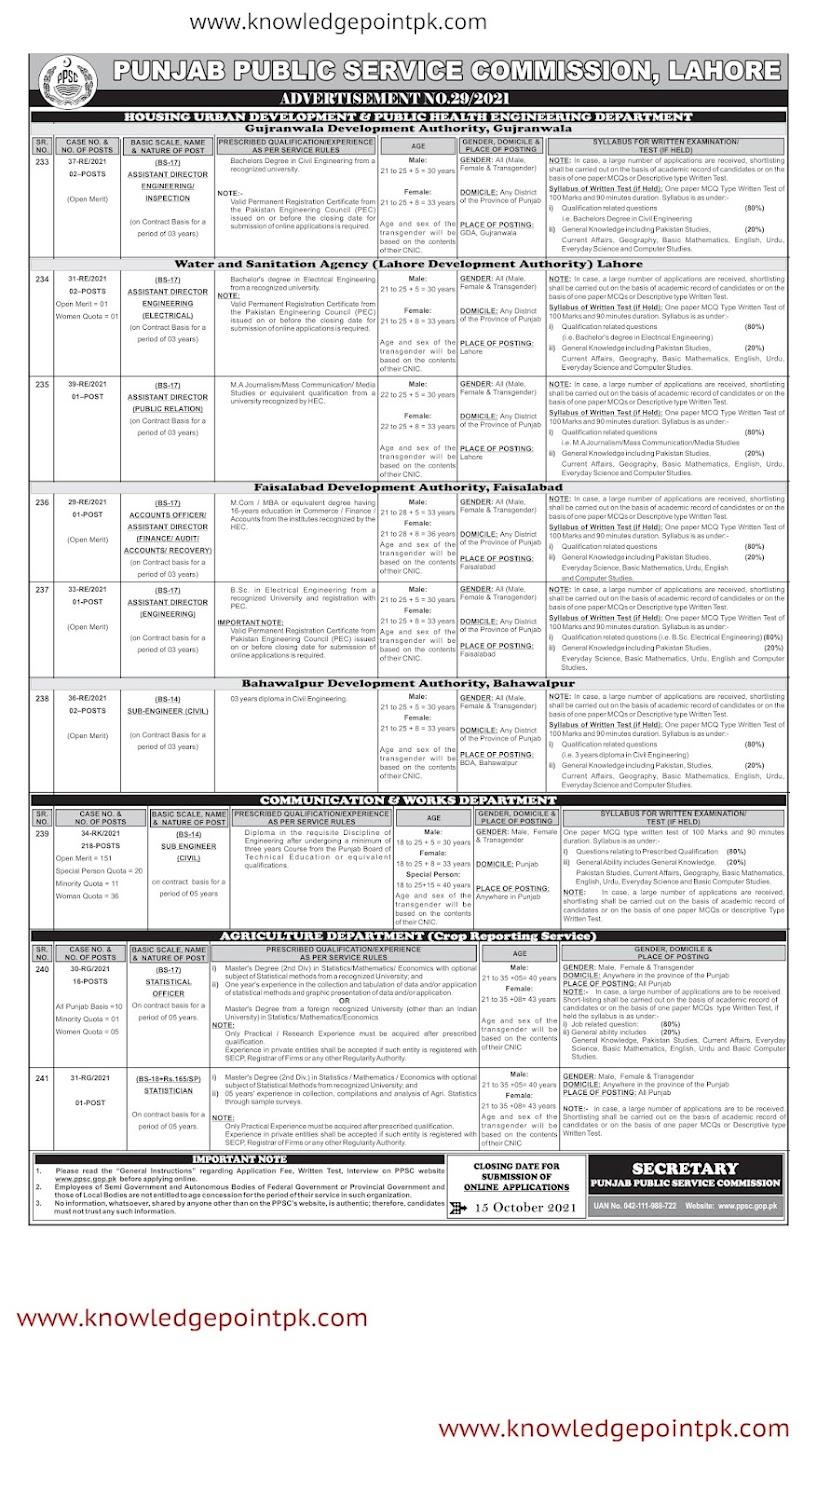 Punjab Public Service Commission PPSC Latest New Jobs 2021 - Apply online Ad No 29